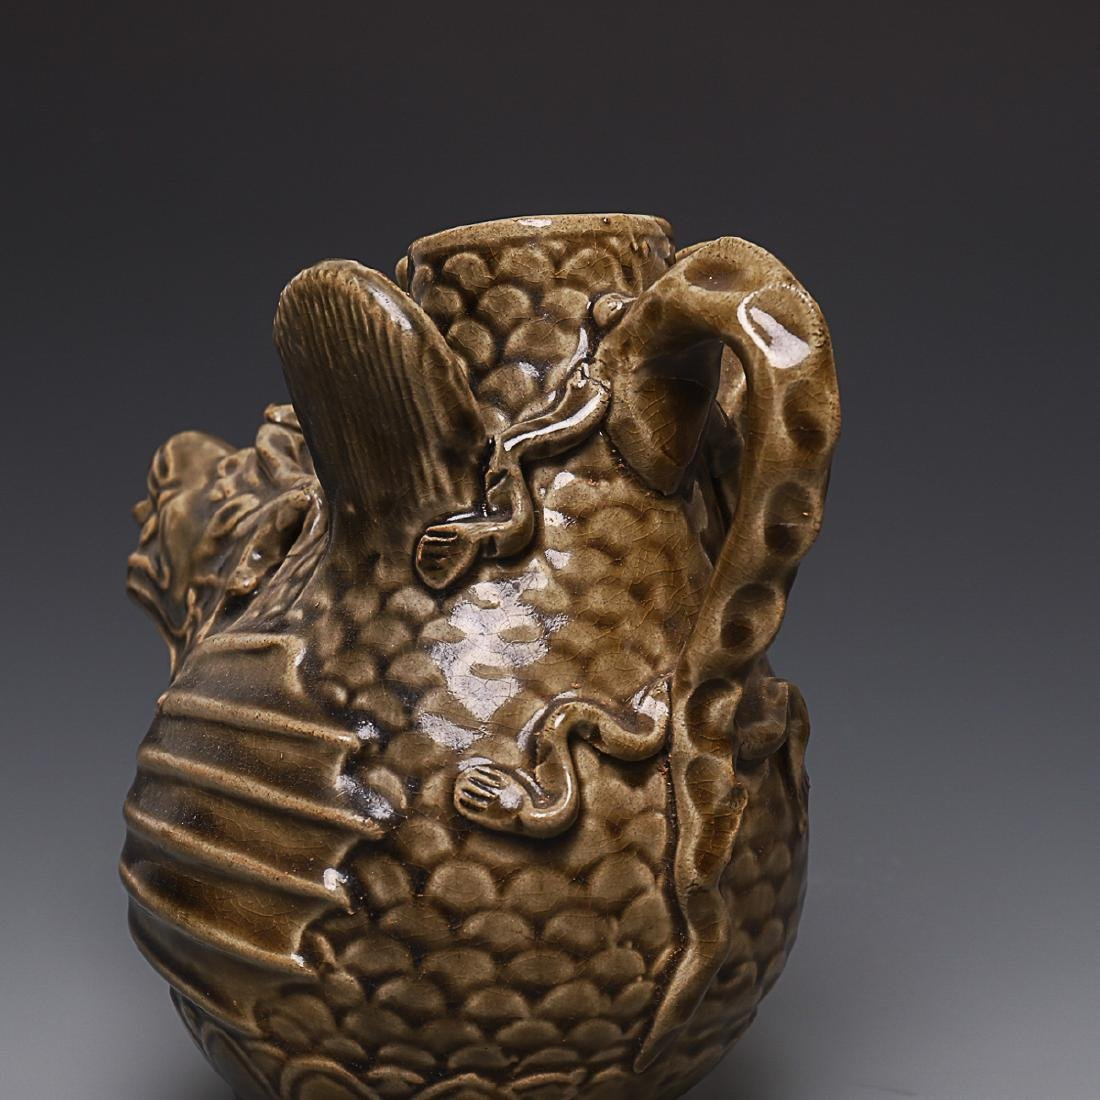 Vintage Chinese Porcelain Pot - 8